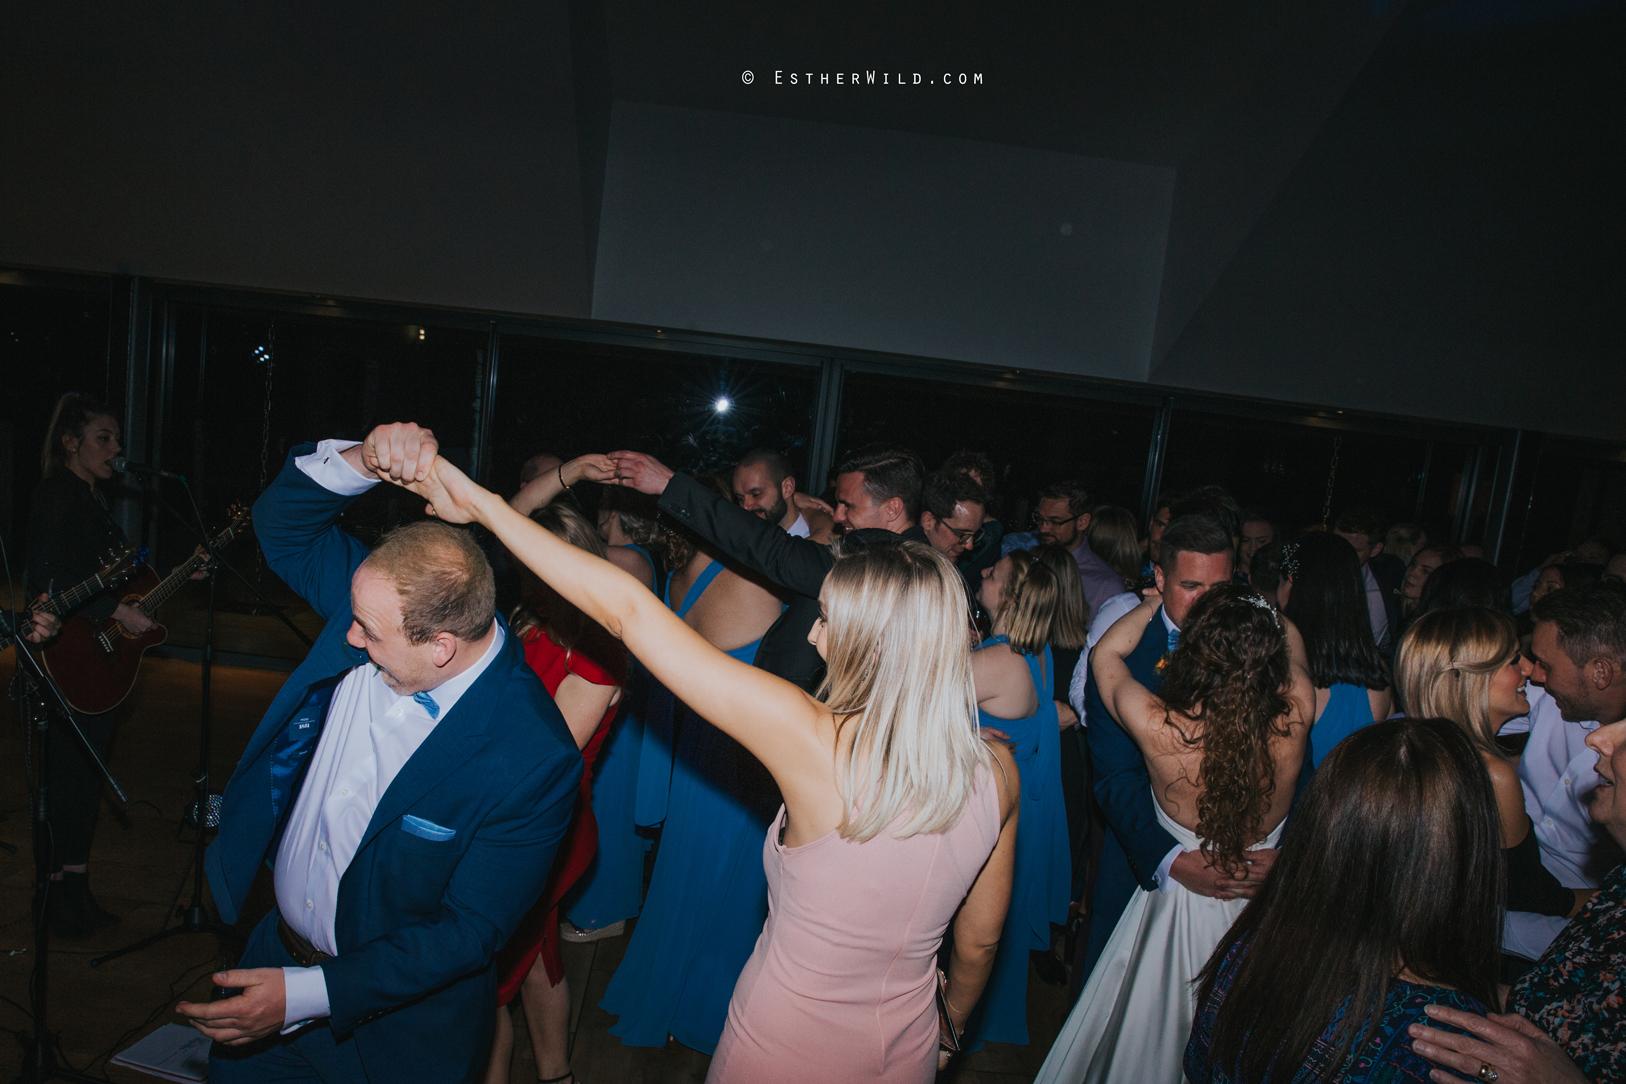 The_BoatHouse_Wedding_Venue_Ormesby_Norfolk_Broads_Boat_Wedding_Photography_Esther_Wild_Photographer_IMG_3599.jpg